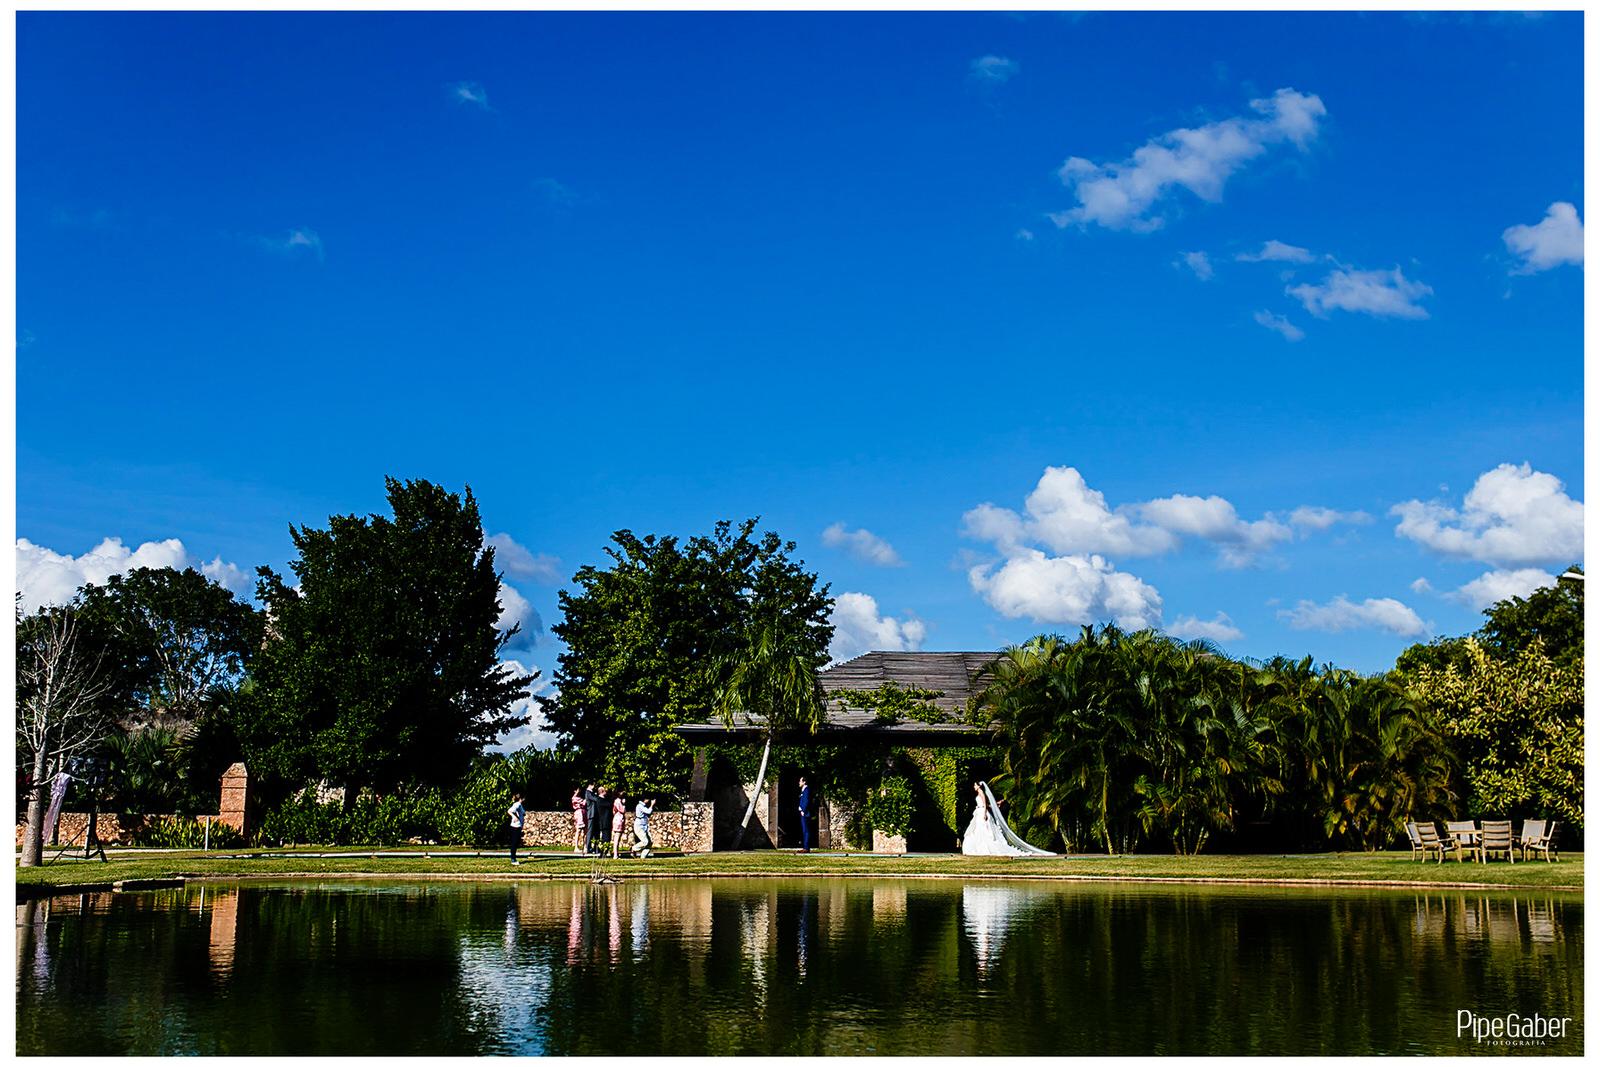 Boda_destino_yucatan_monterrey_fotograf_wedding_photographer_006.JPG